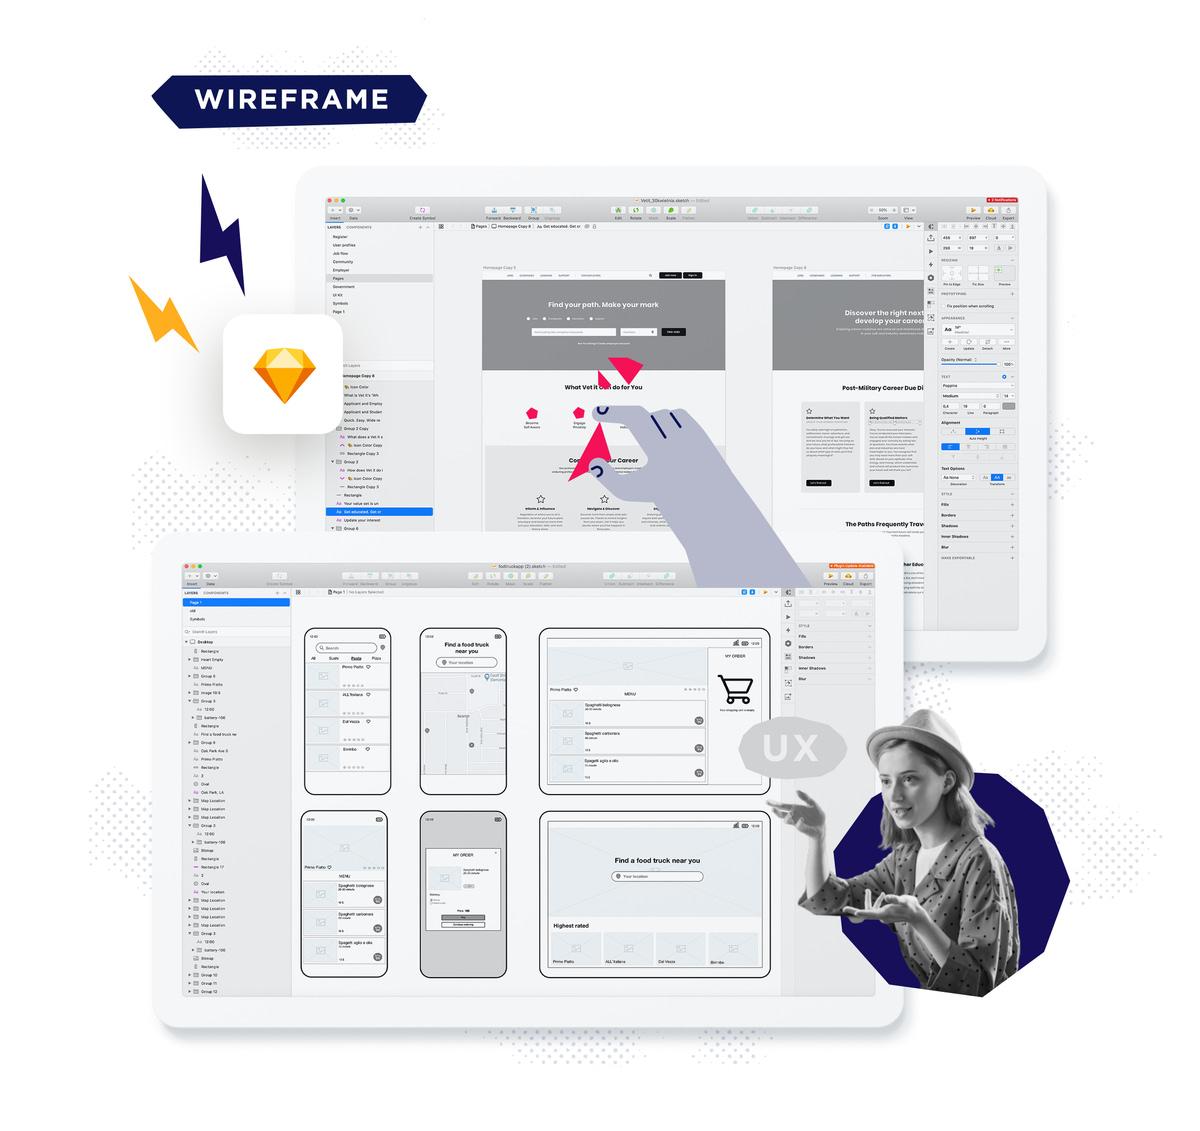 wireframe app design template